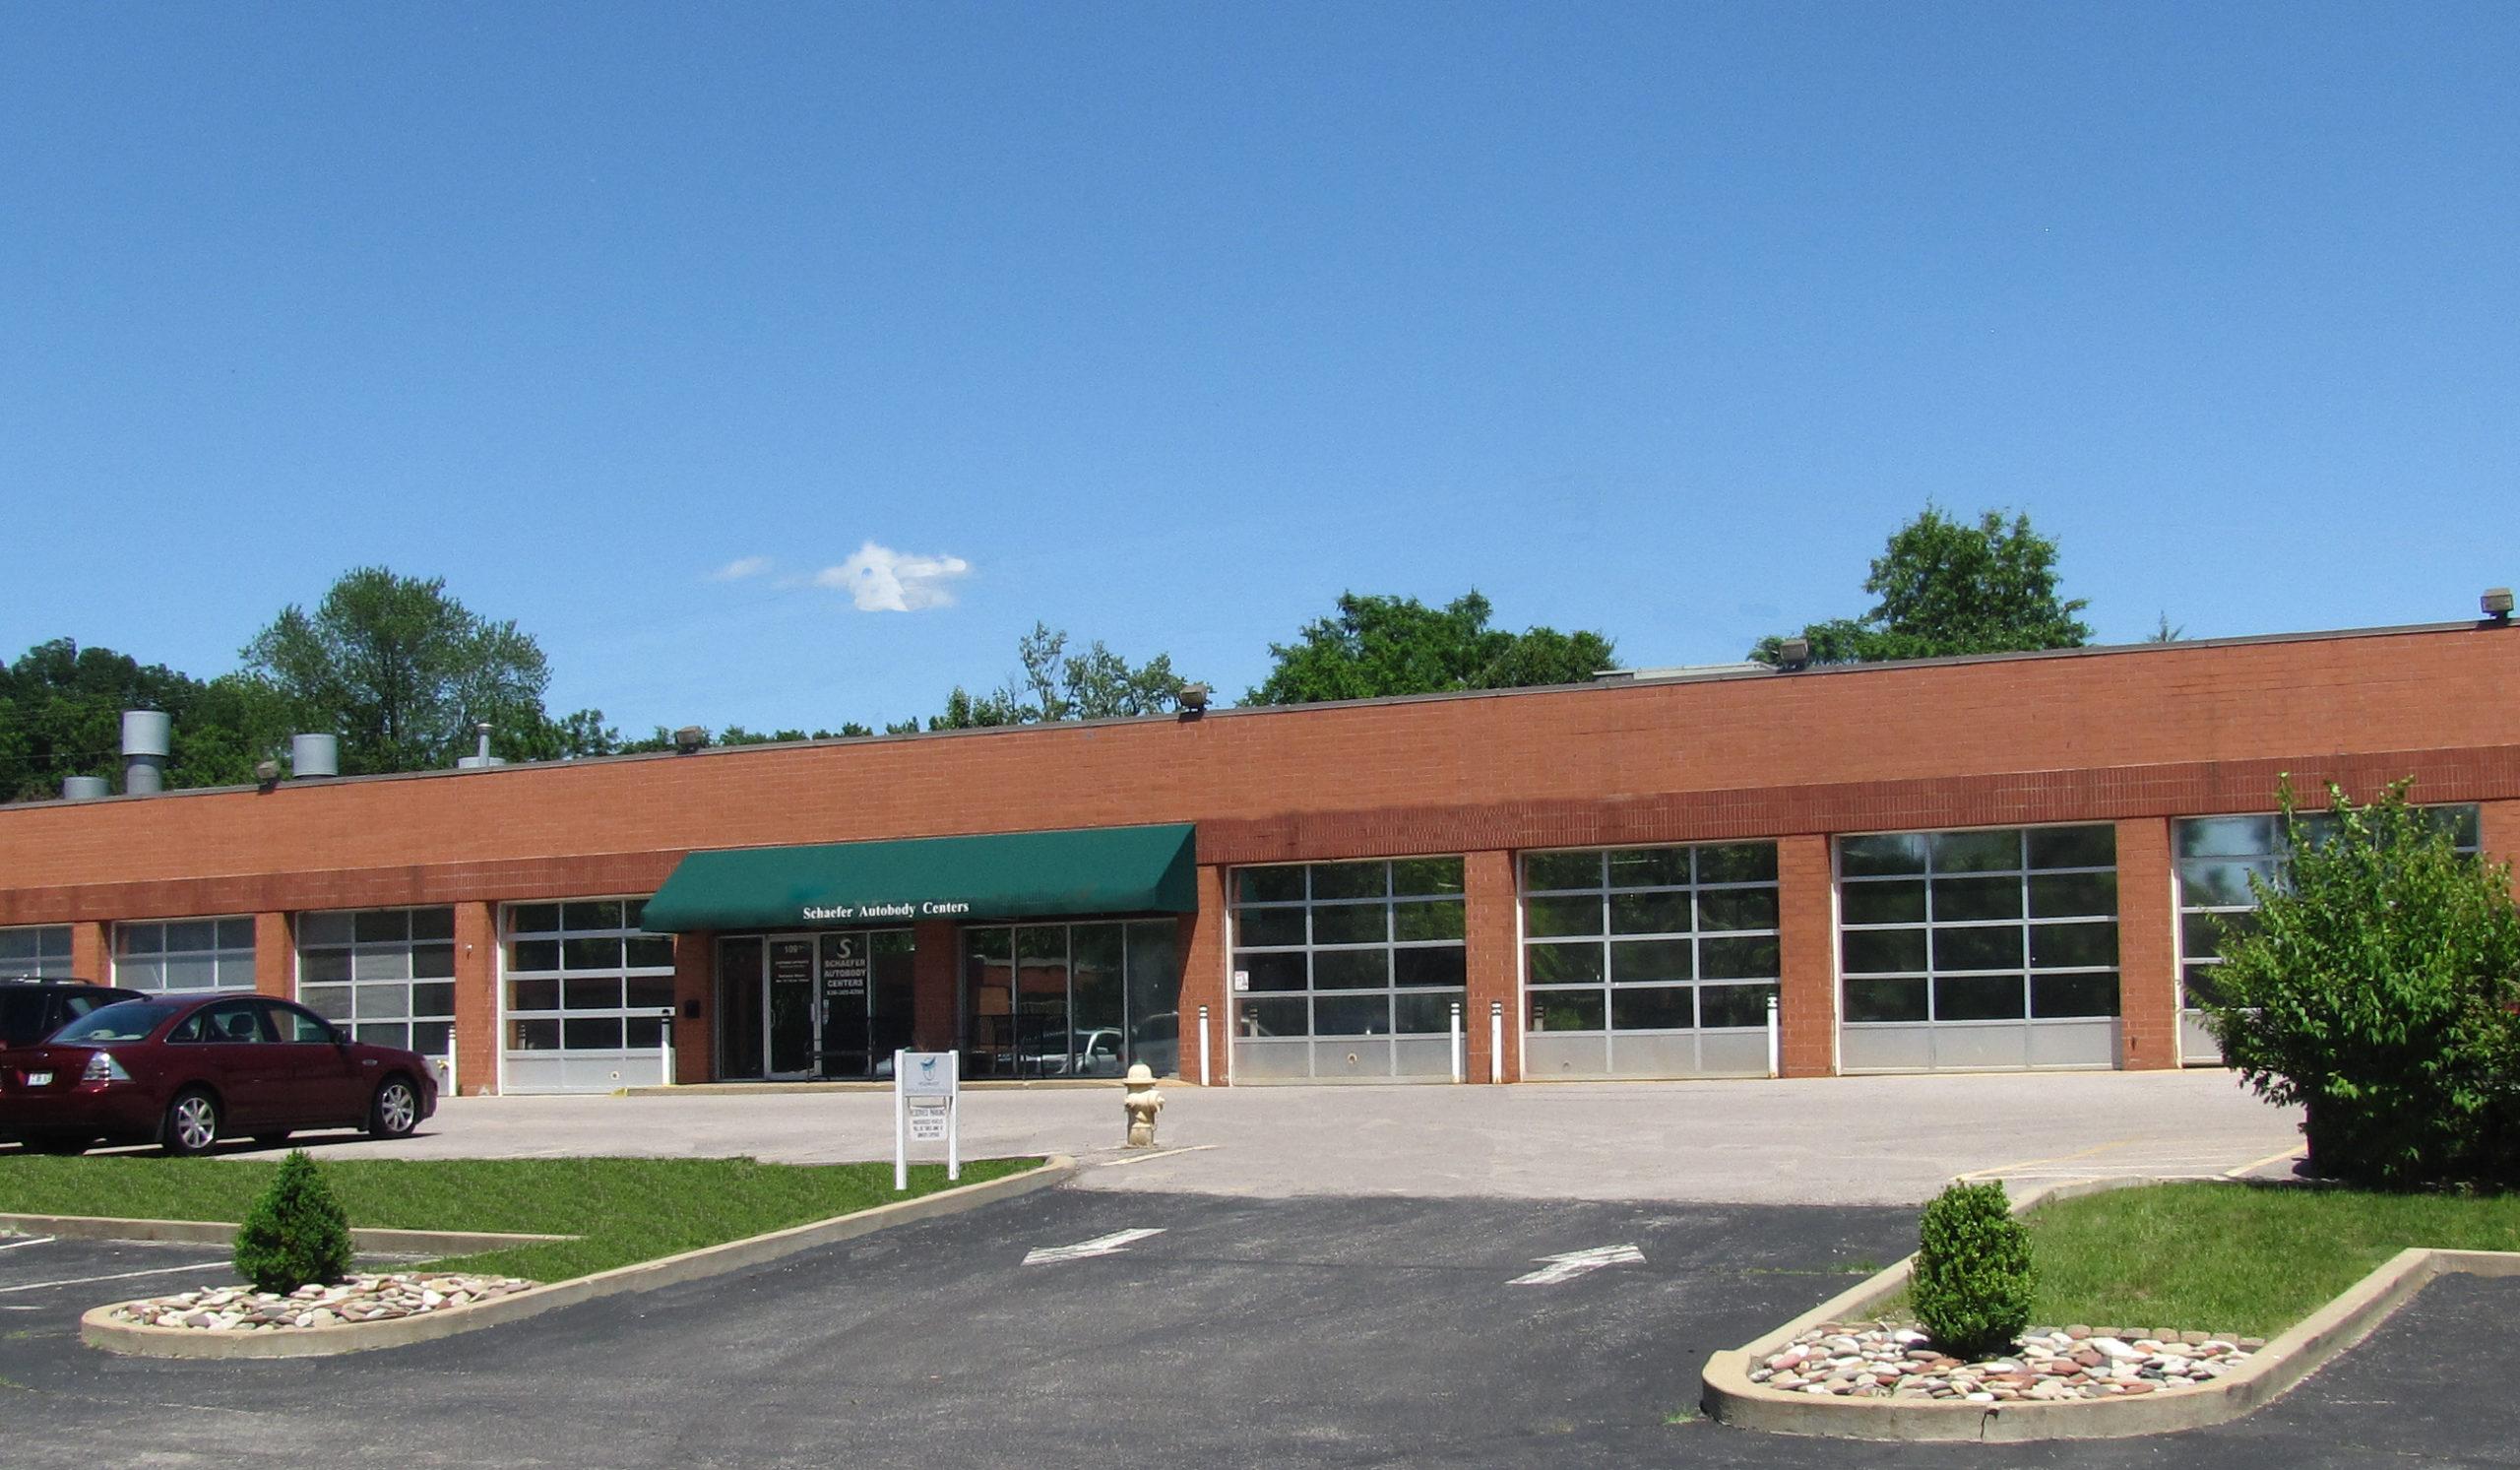 Exterior of Schaefer Auto Body Shop in Ellisville, MO